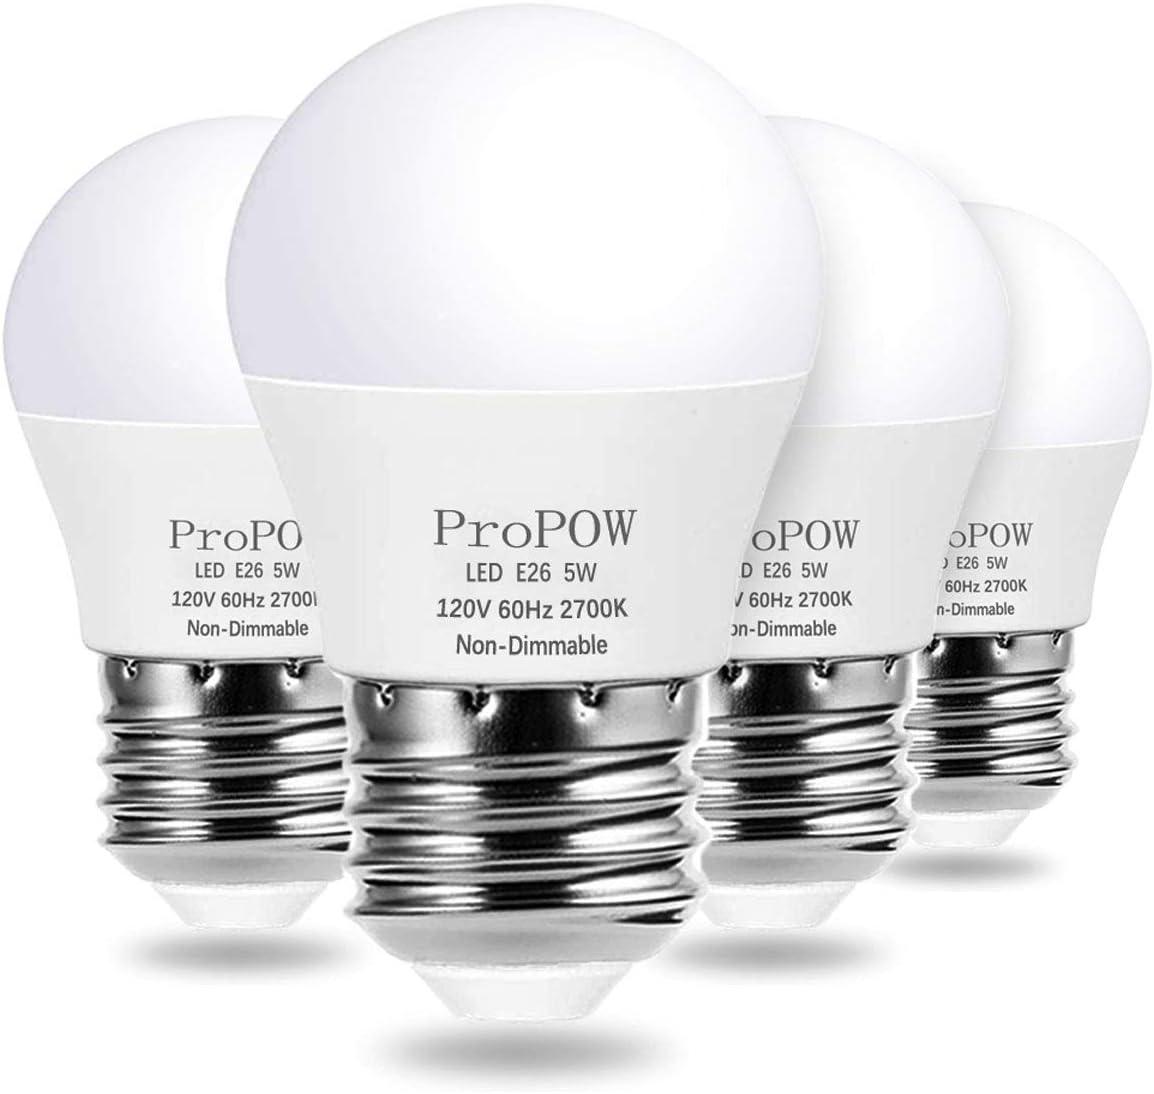 A10 LED Bulb 10 Watt Equivalent, ProPOW 10W LED Light Bulbs, Soft White  10K Energy Saving Low Watt Light Bulbs,E10 Base Bulb for Home Bedroom(10  Pack)